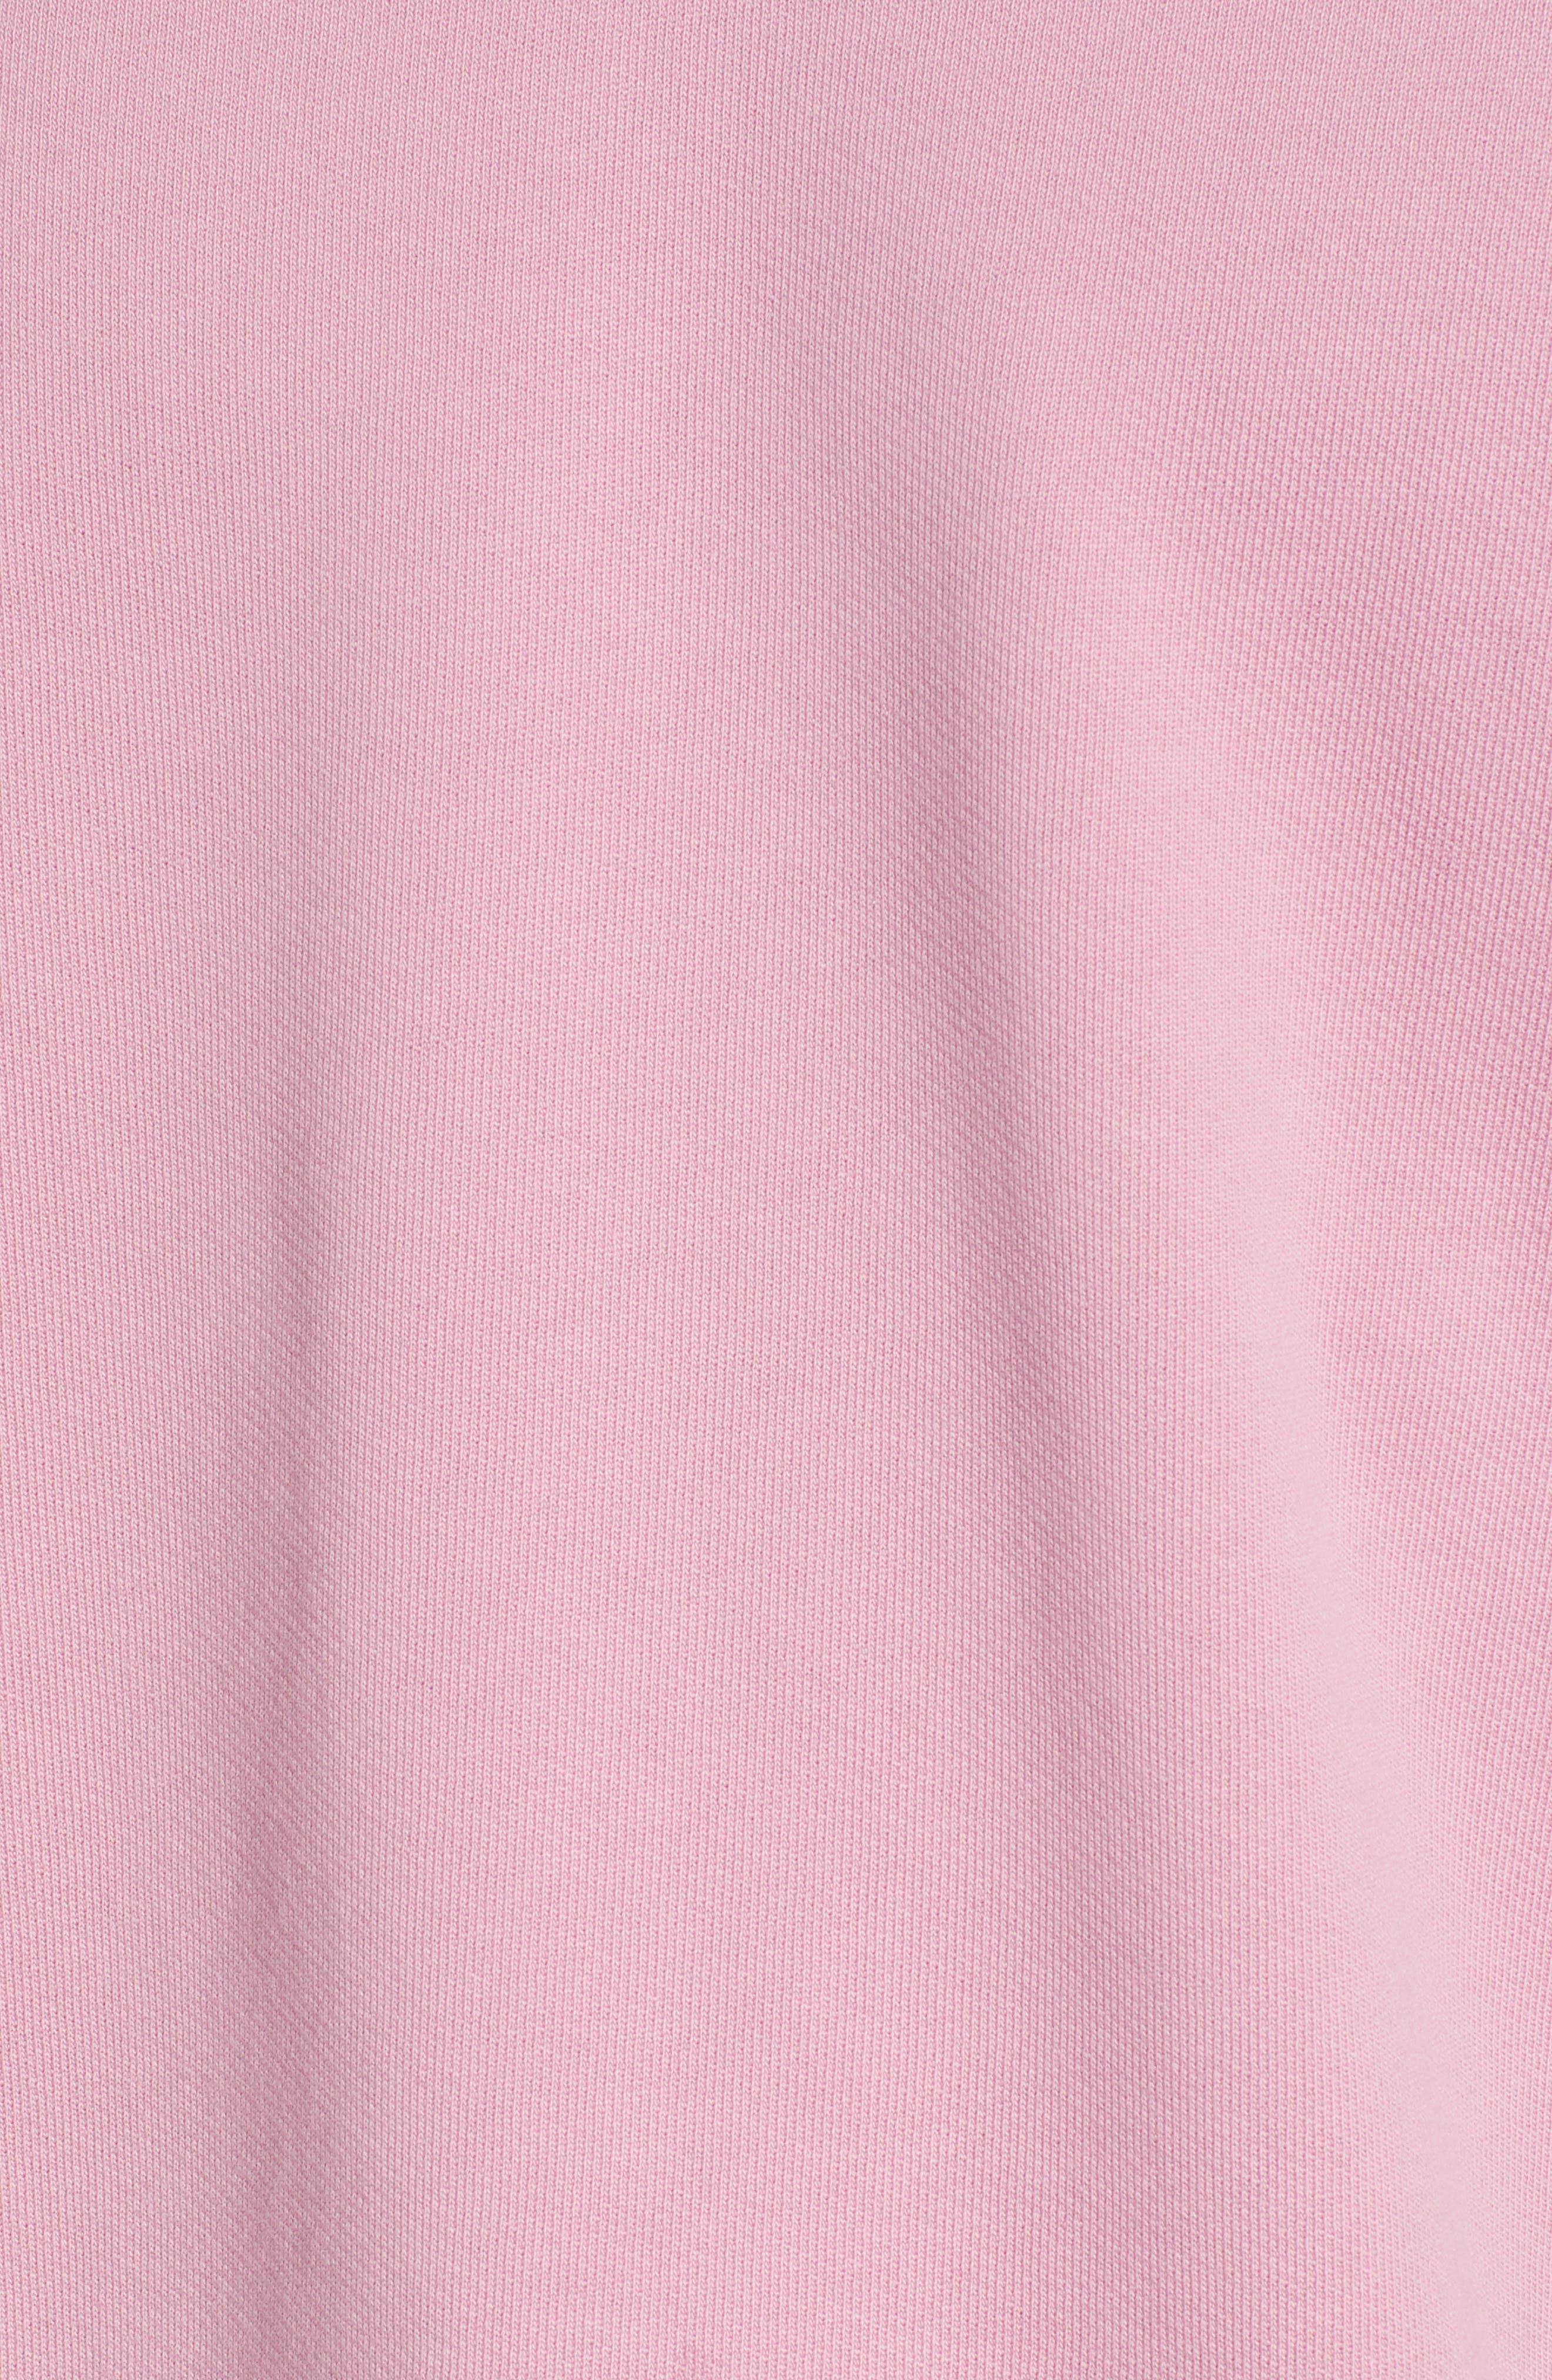 Cotton Terry Sweatshirt,                             Alternate thumbnail 10, color,